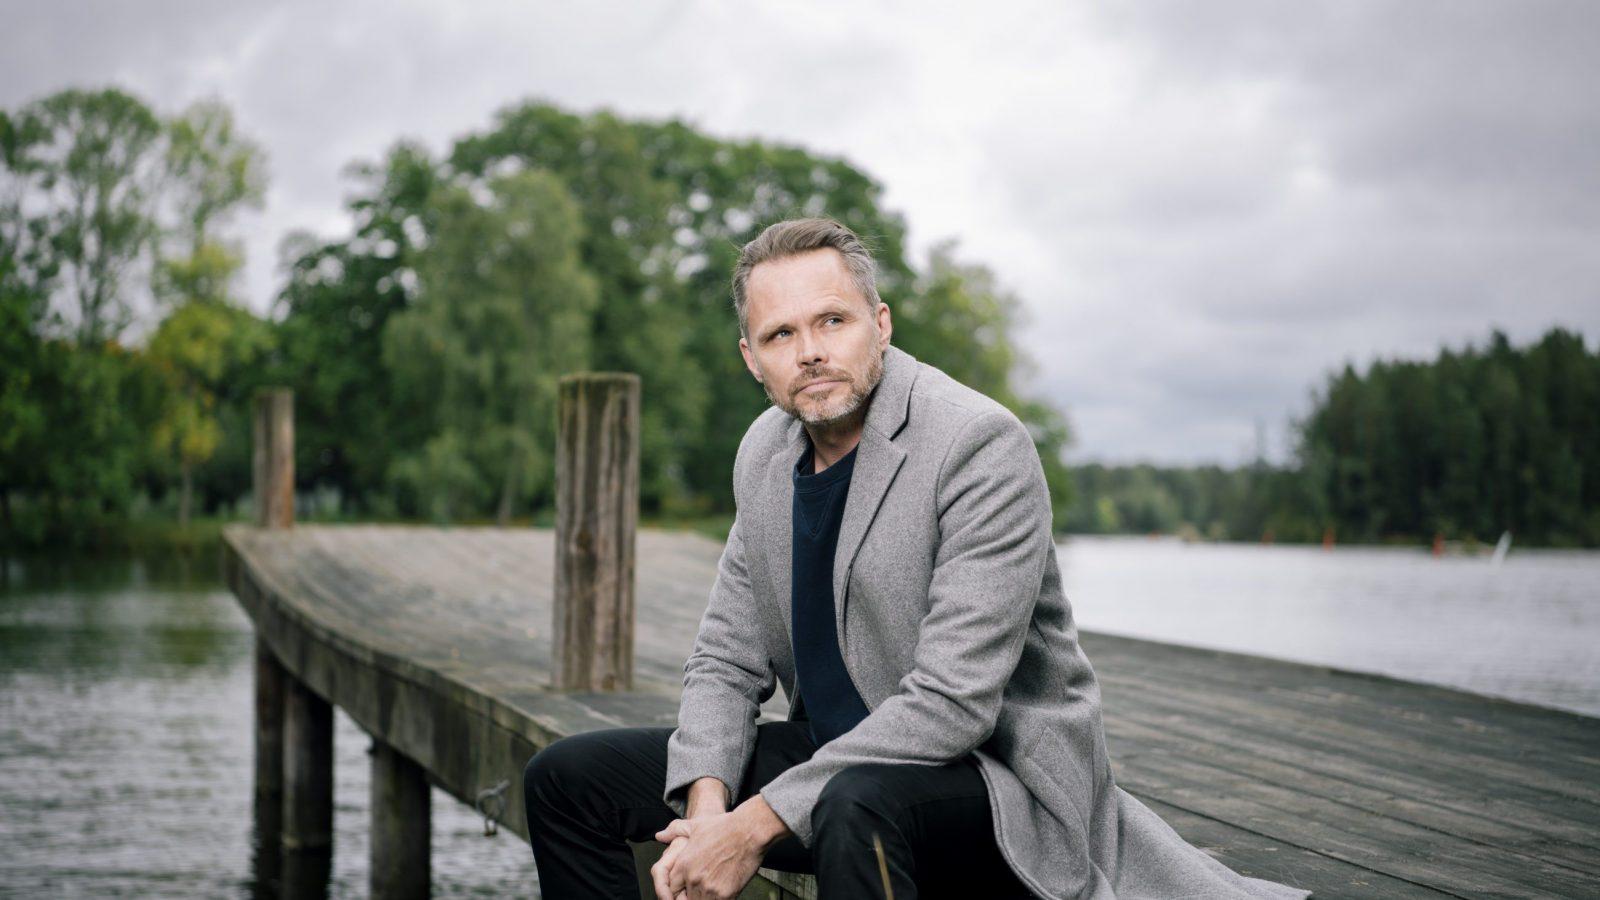 Mikael Genberg 2170 - Bilde Petteri Mustonen - (Arkiv - Talerforum)